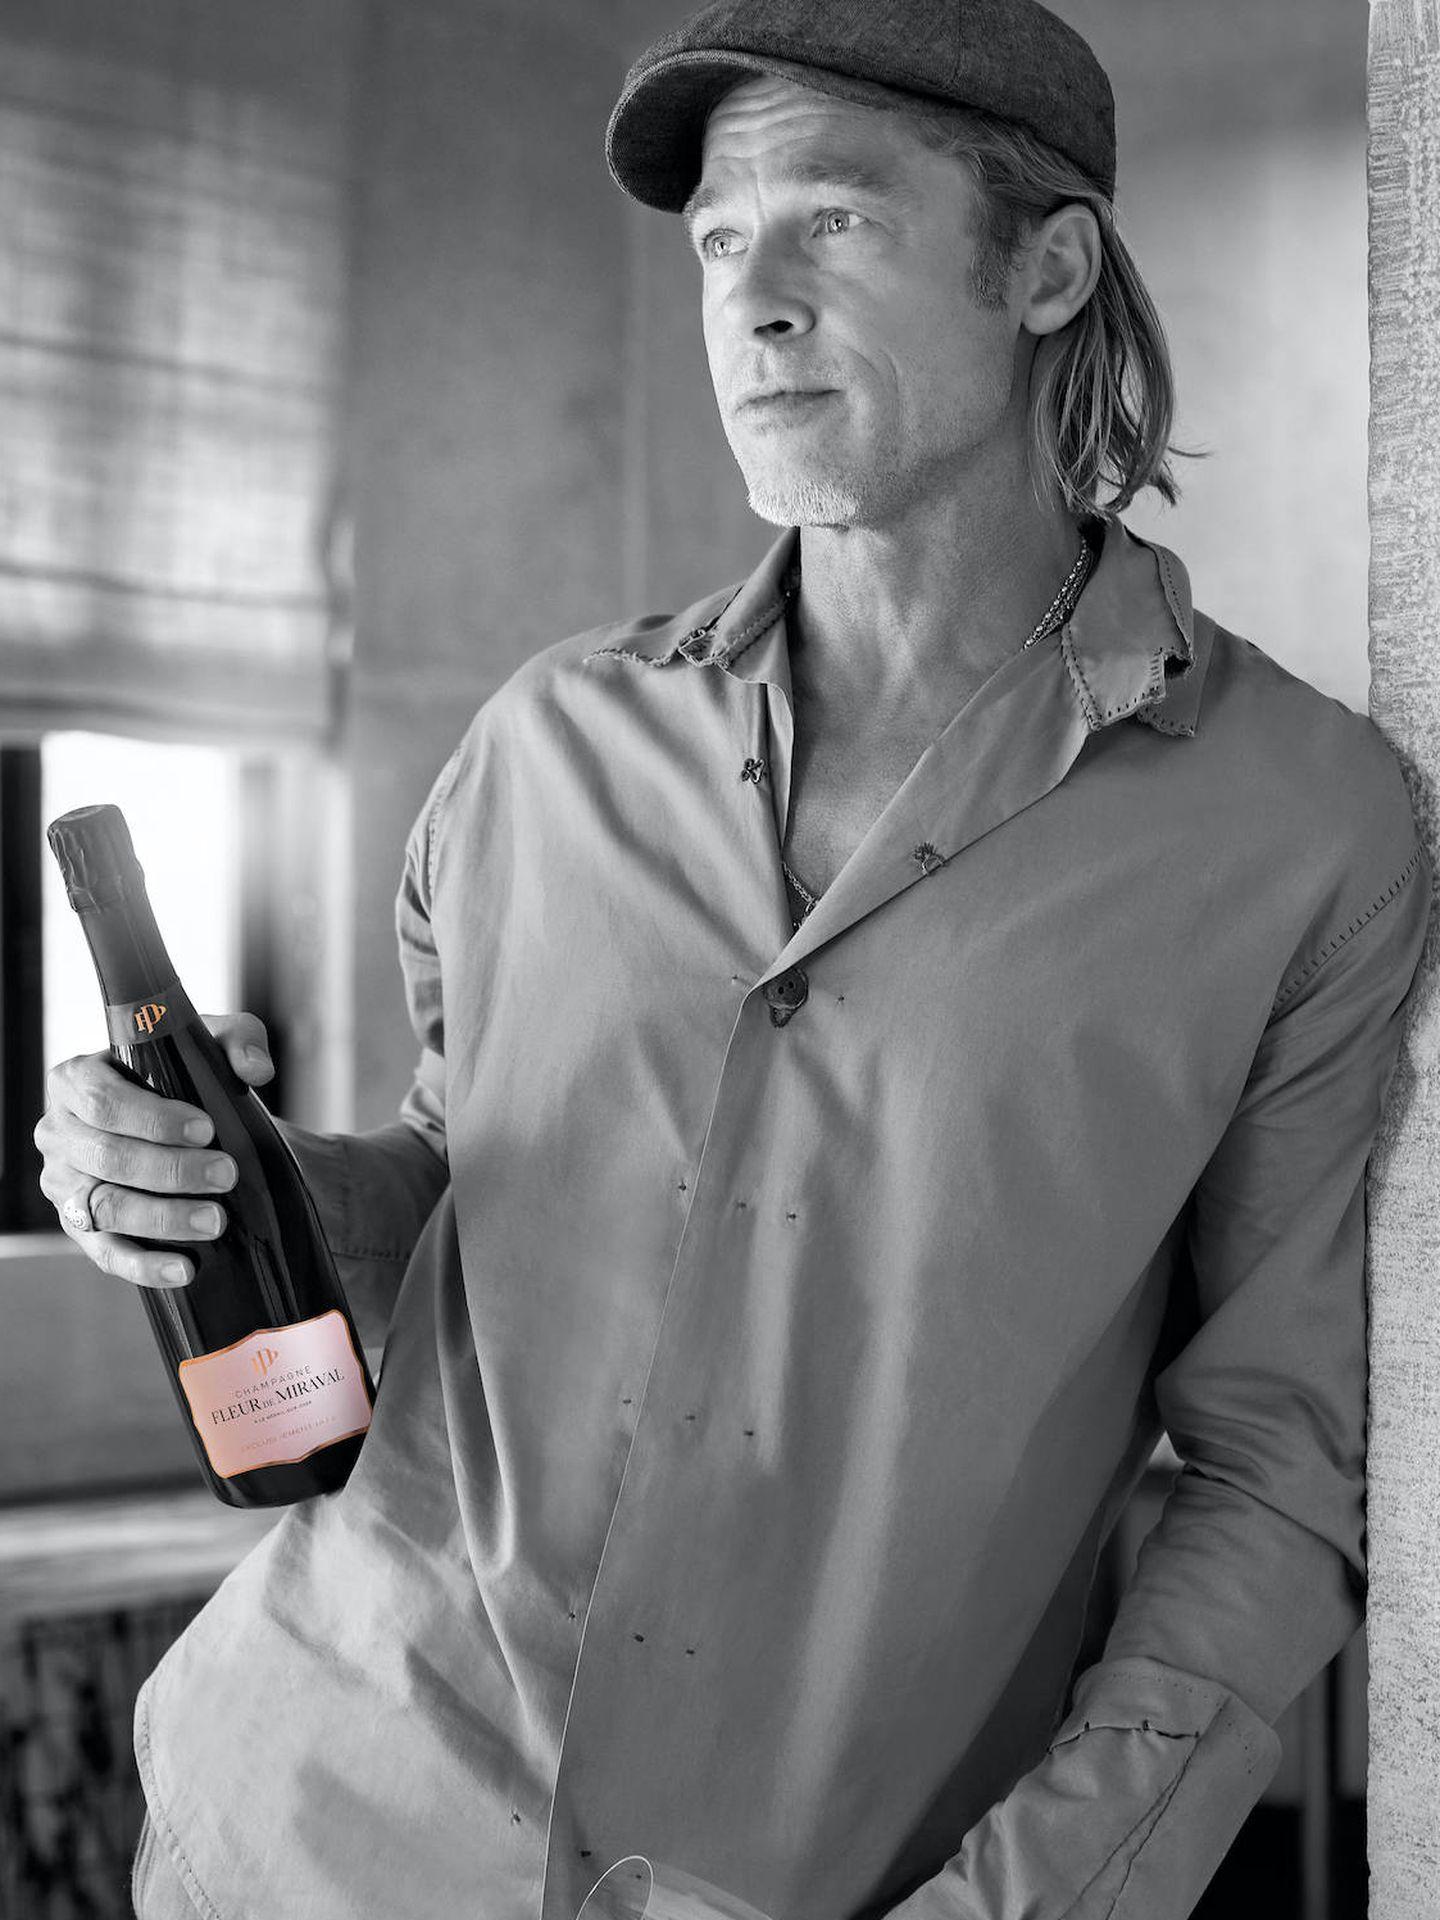 Brad Pitt y su champán. (Fleur de Miraval)